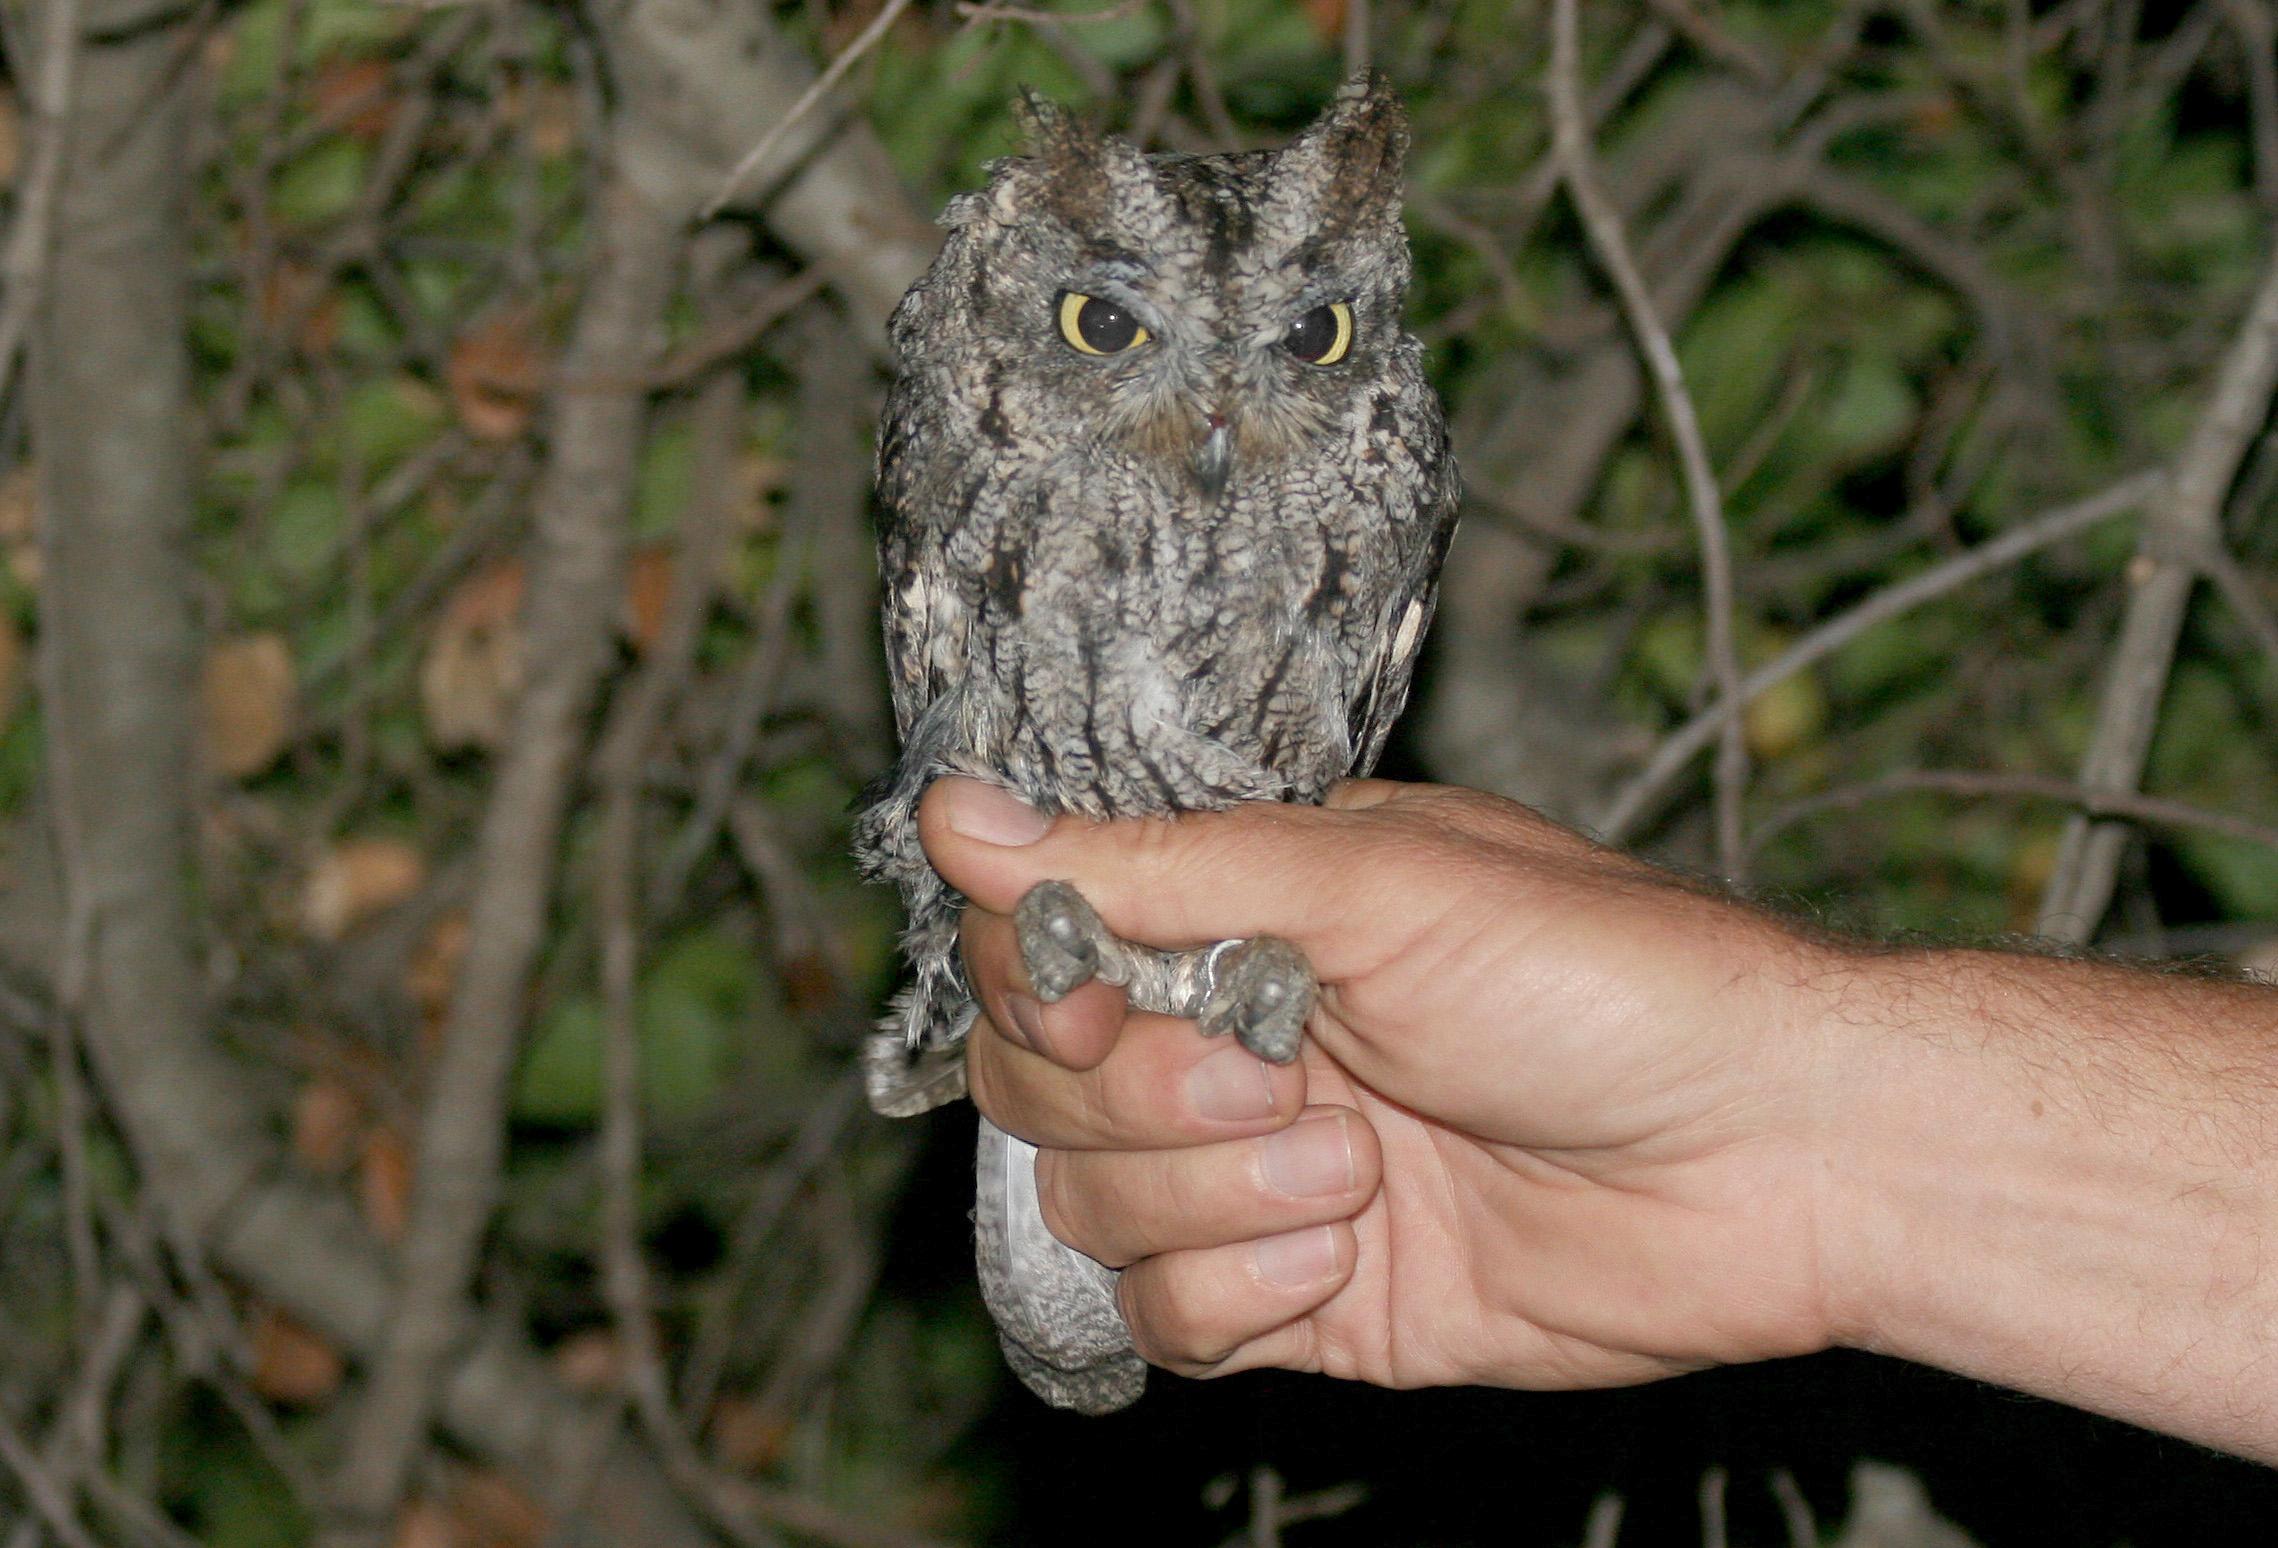 Western screech owl otus kennicottii